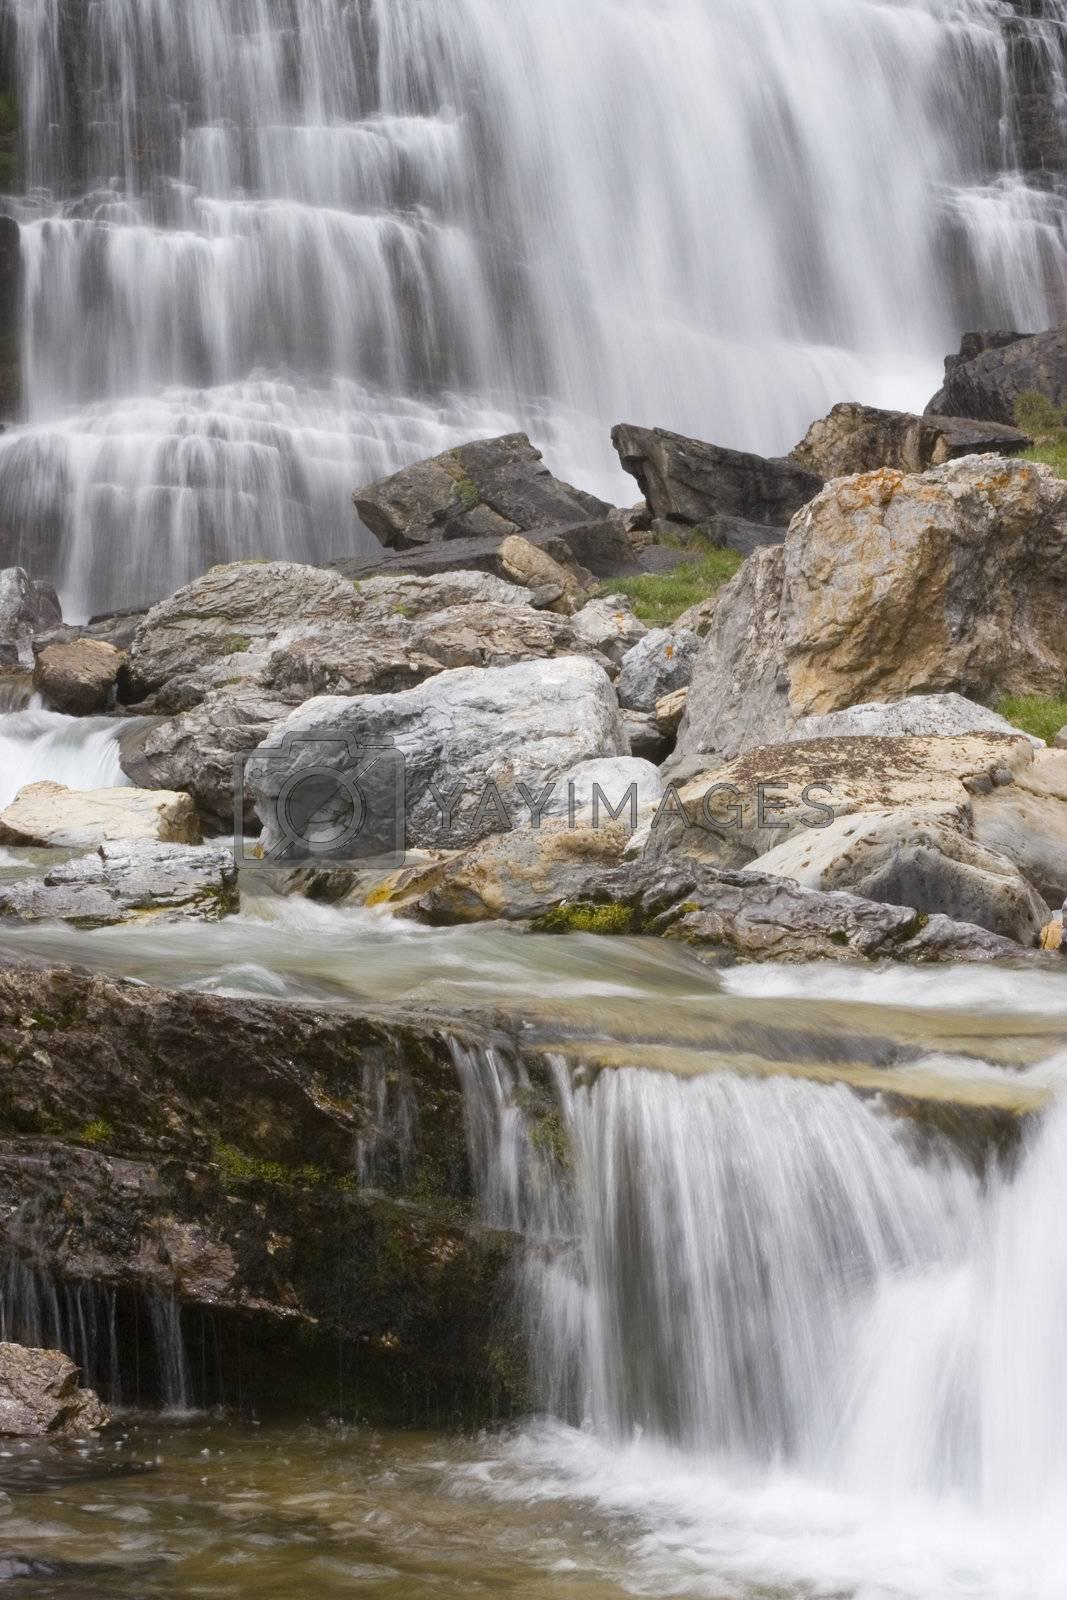 Cola de caballo - waterfall in the spanish national park Ordesa y Monte Perdido